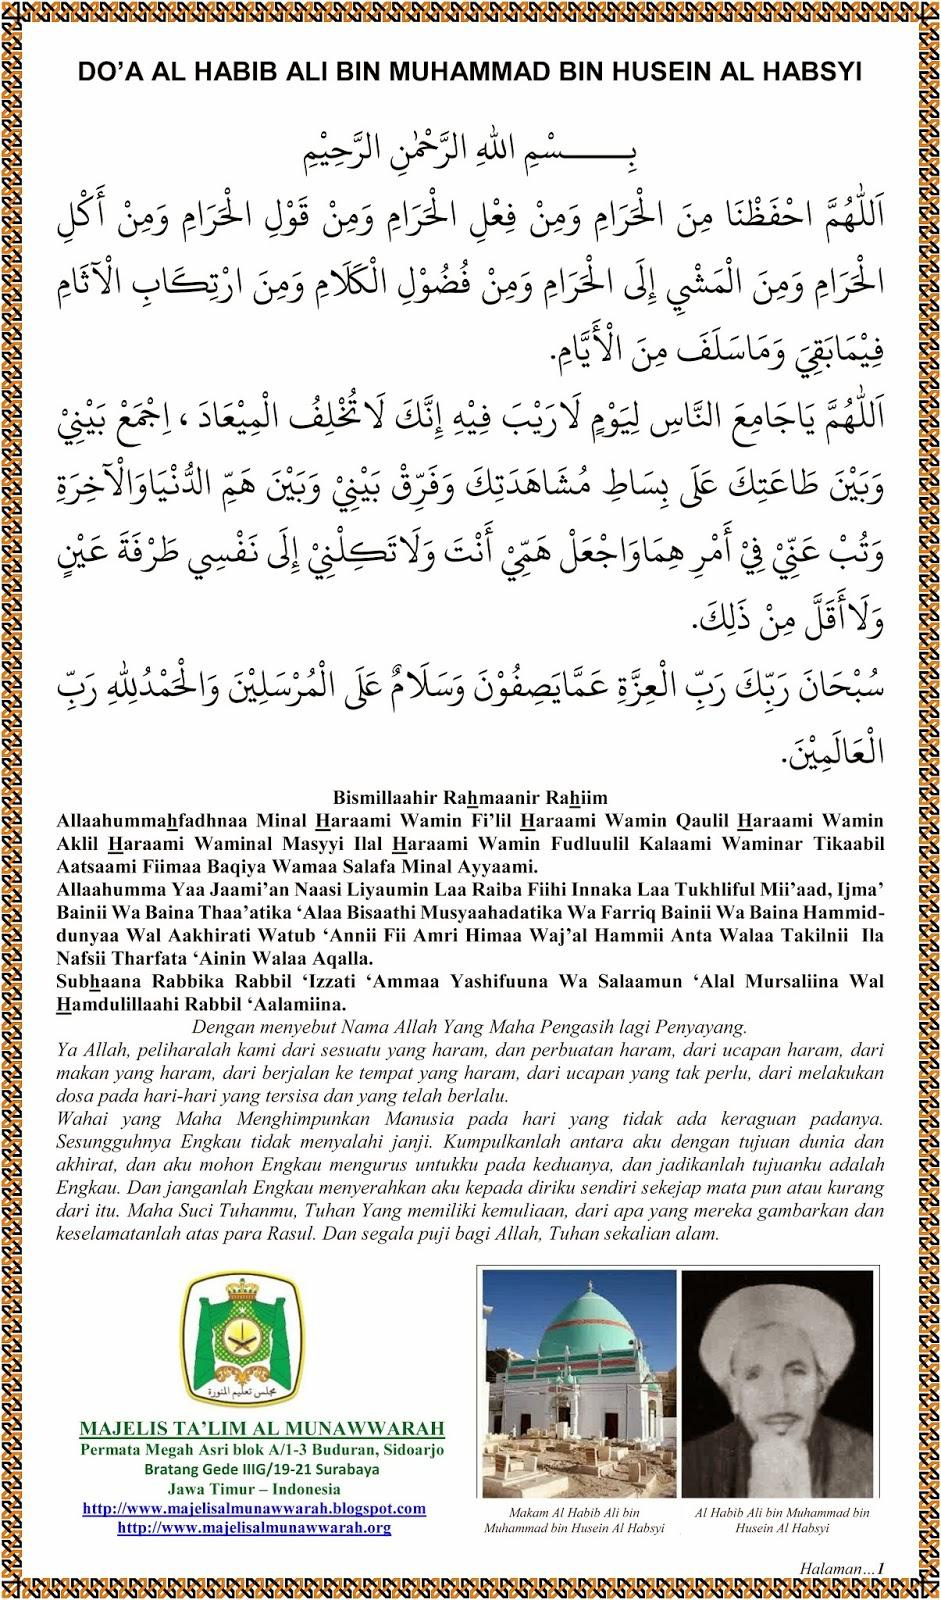 Doa Al Imam Al Qutub Al Habib Ali Bin Muhammad Bin Husein Al Habsyi